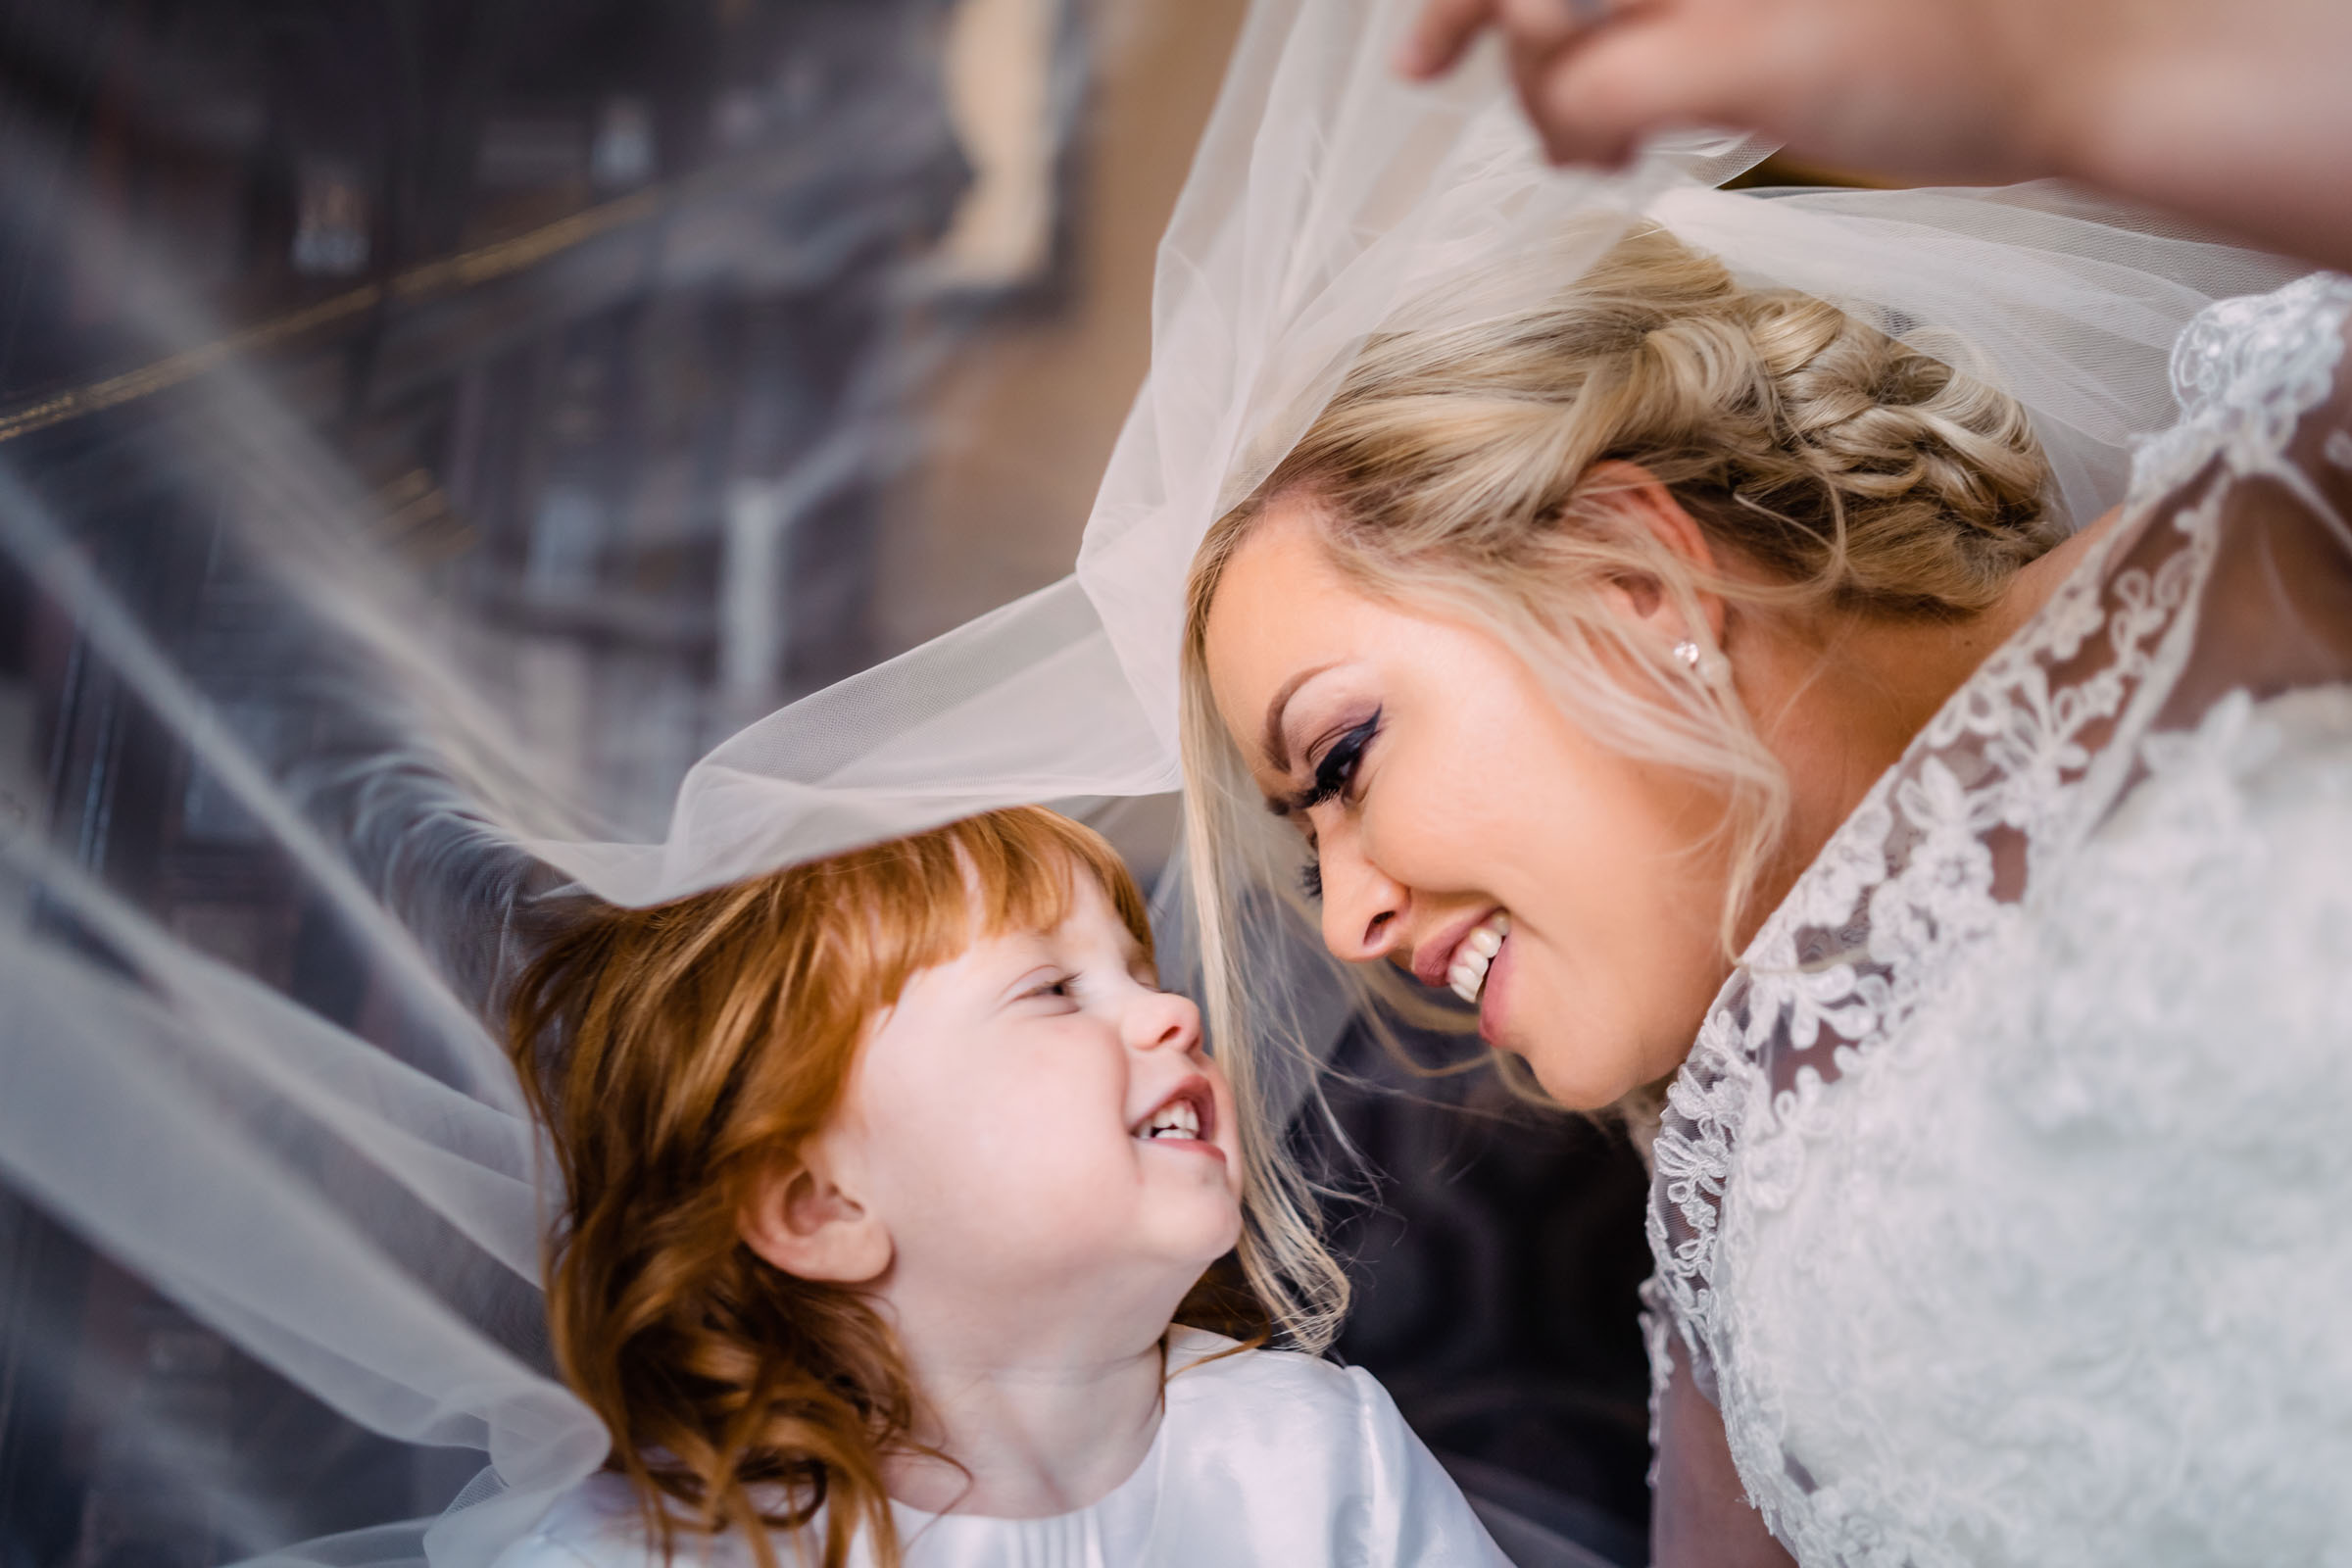 motherwell-moorings-wedding-photographer-dearlyphotography (62 of 77).jpg